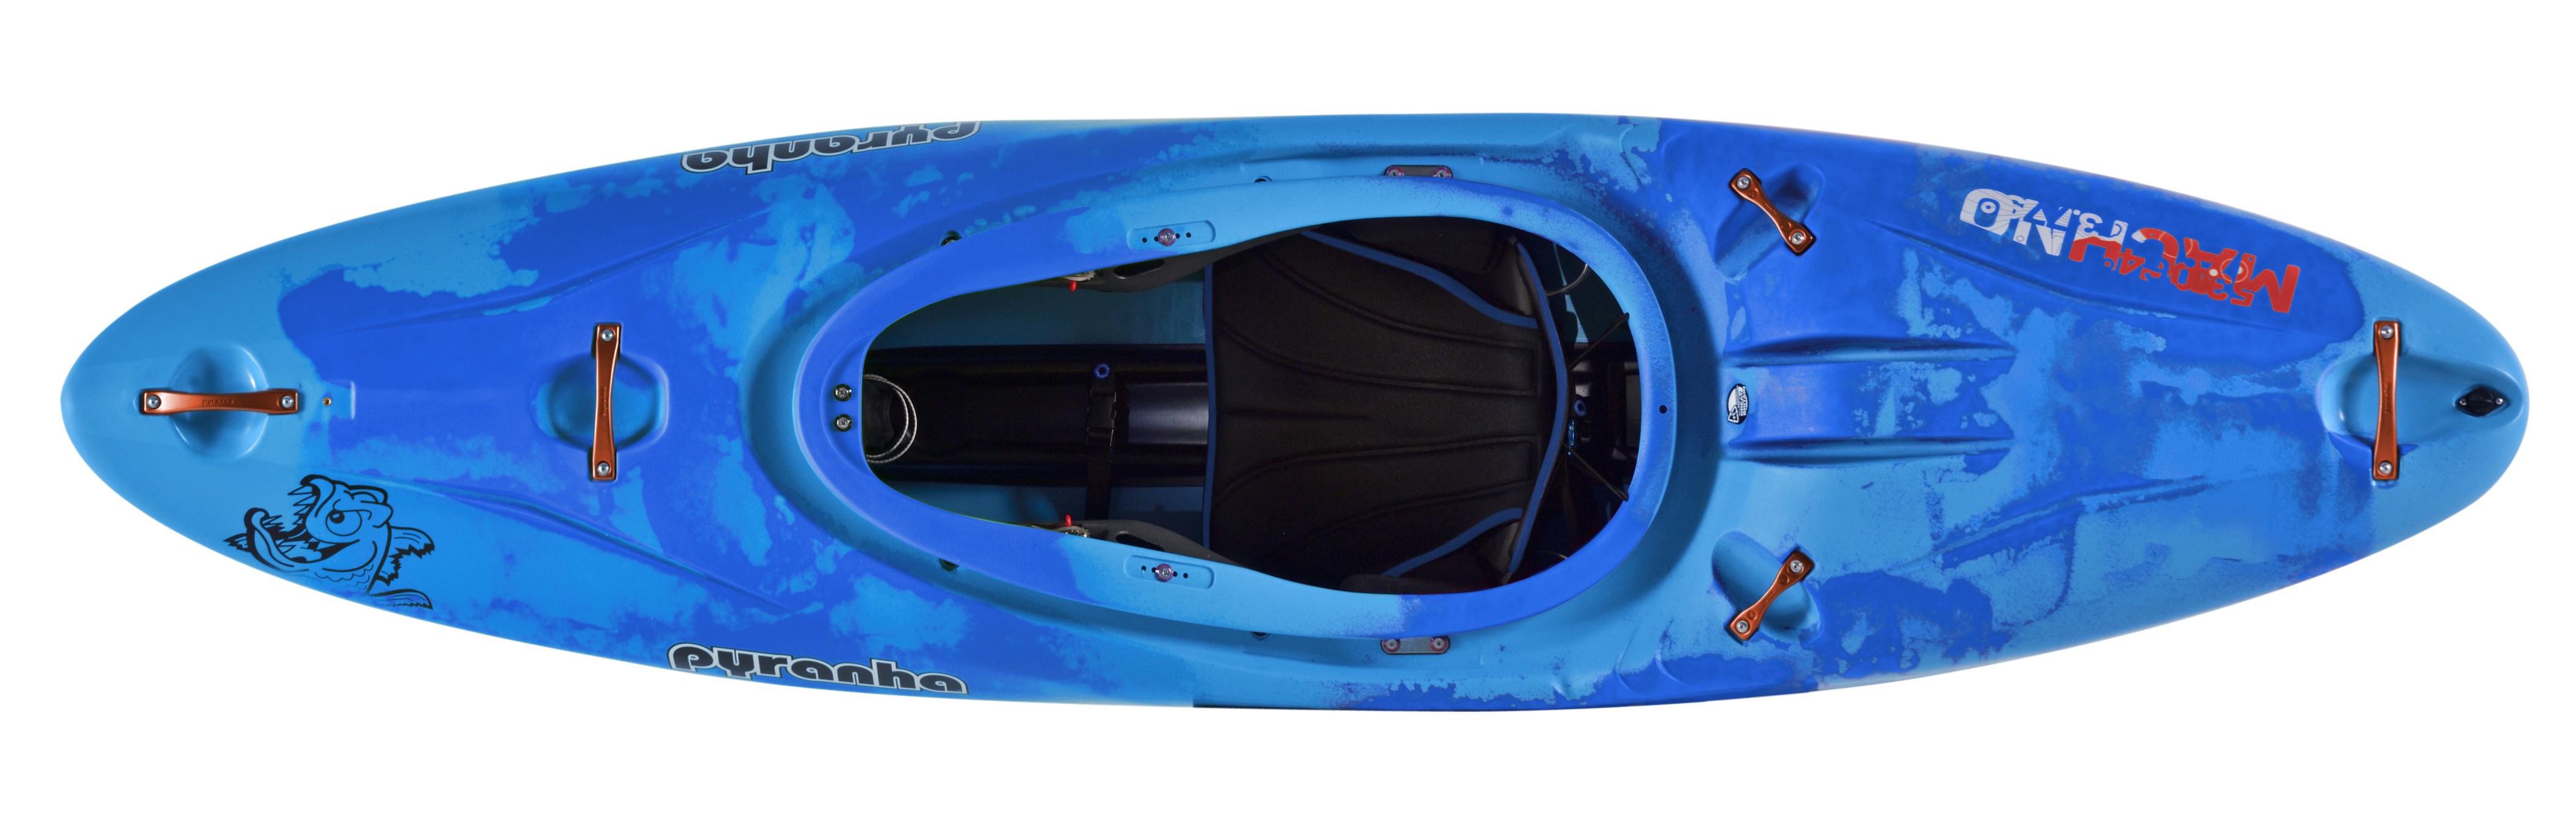 Kayaks: Machno by Pyranha - Image 2808